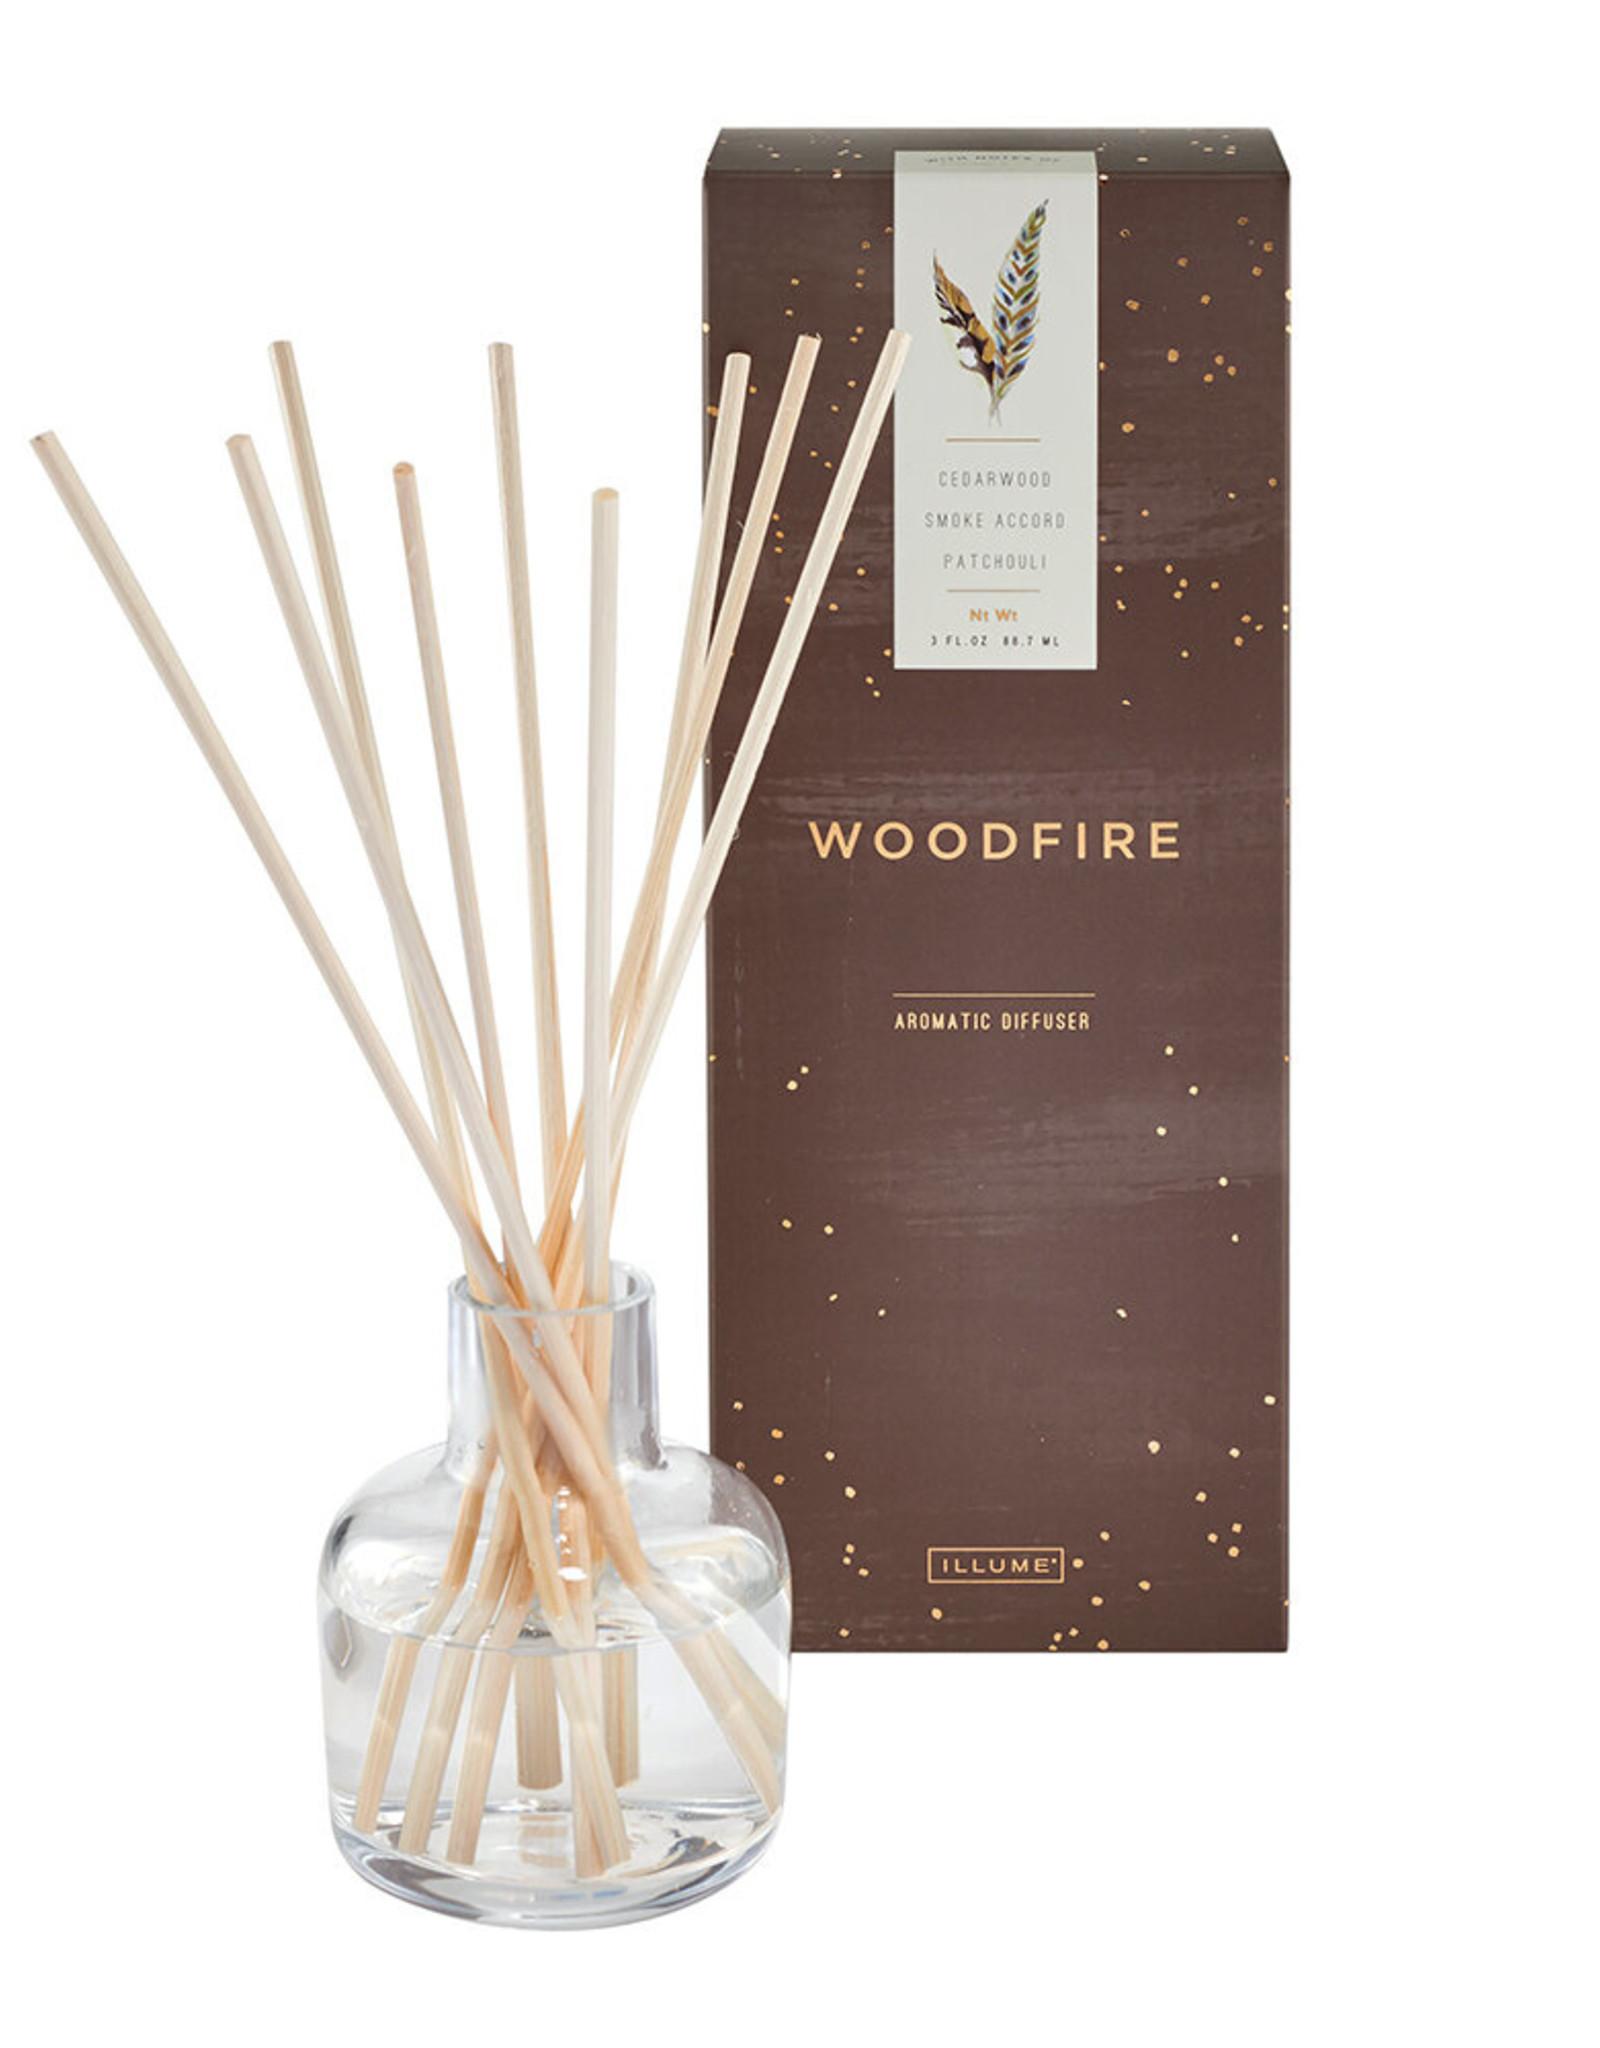 Woodfire Reed Diffuser, 3 fl oz